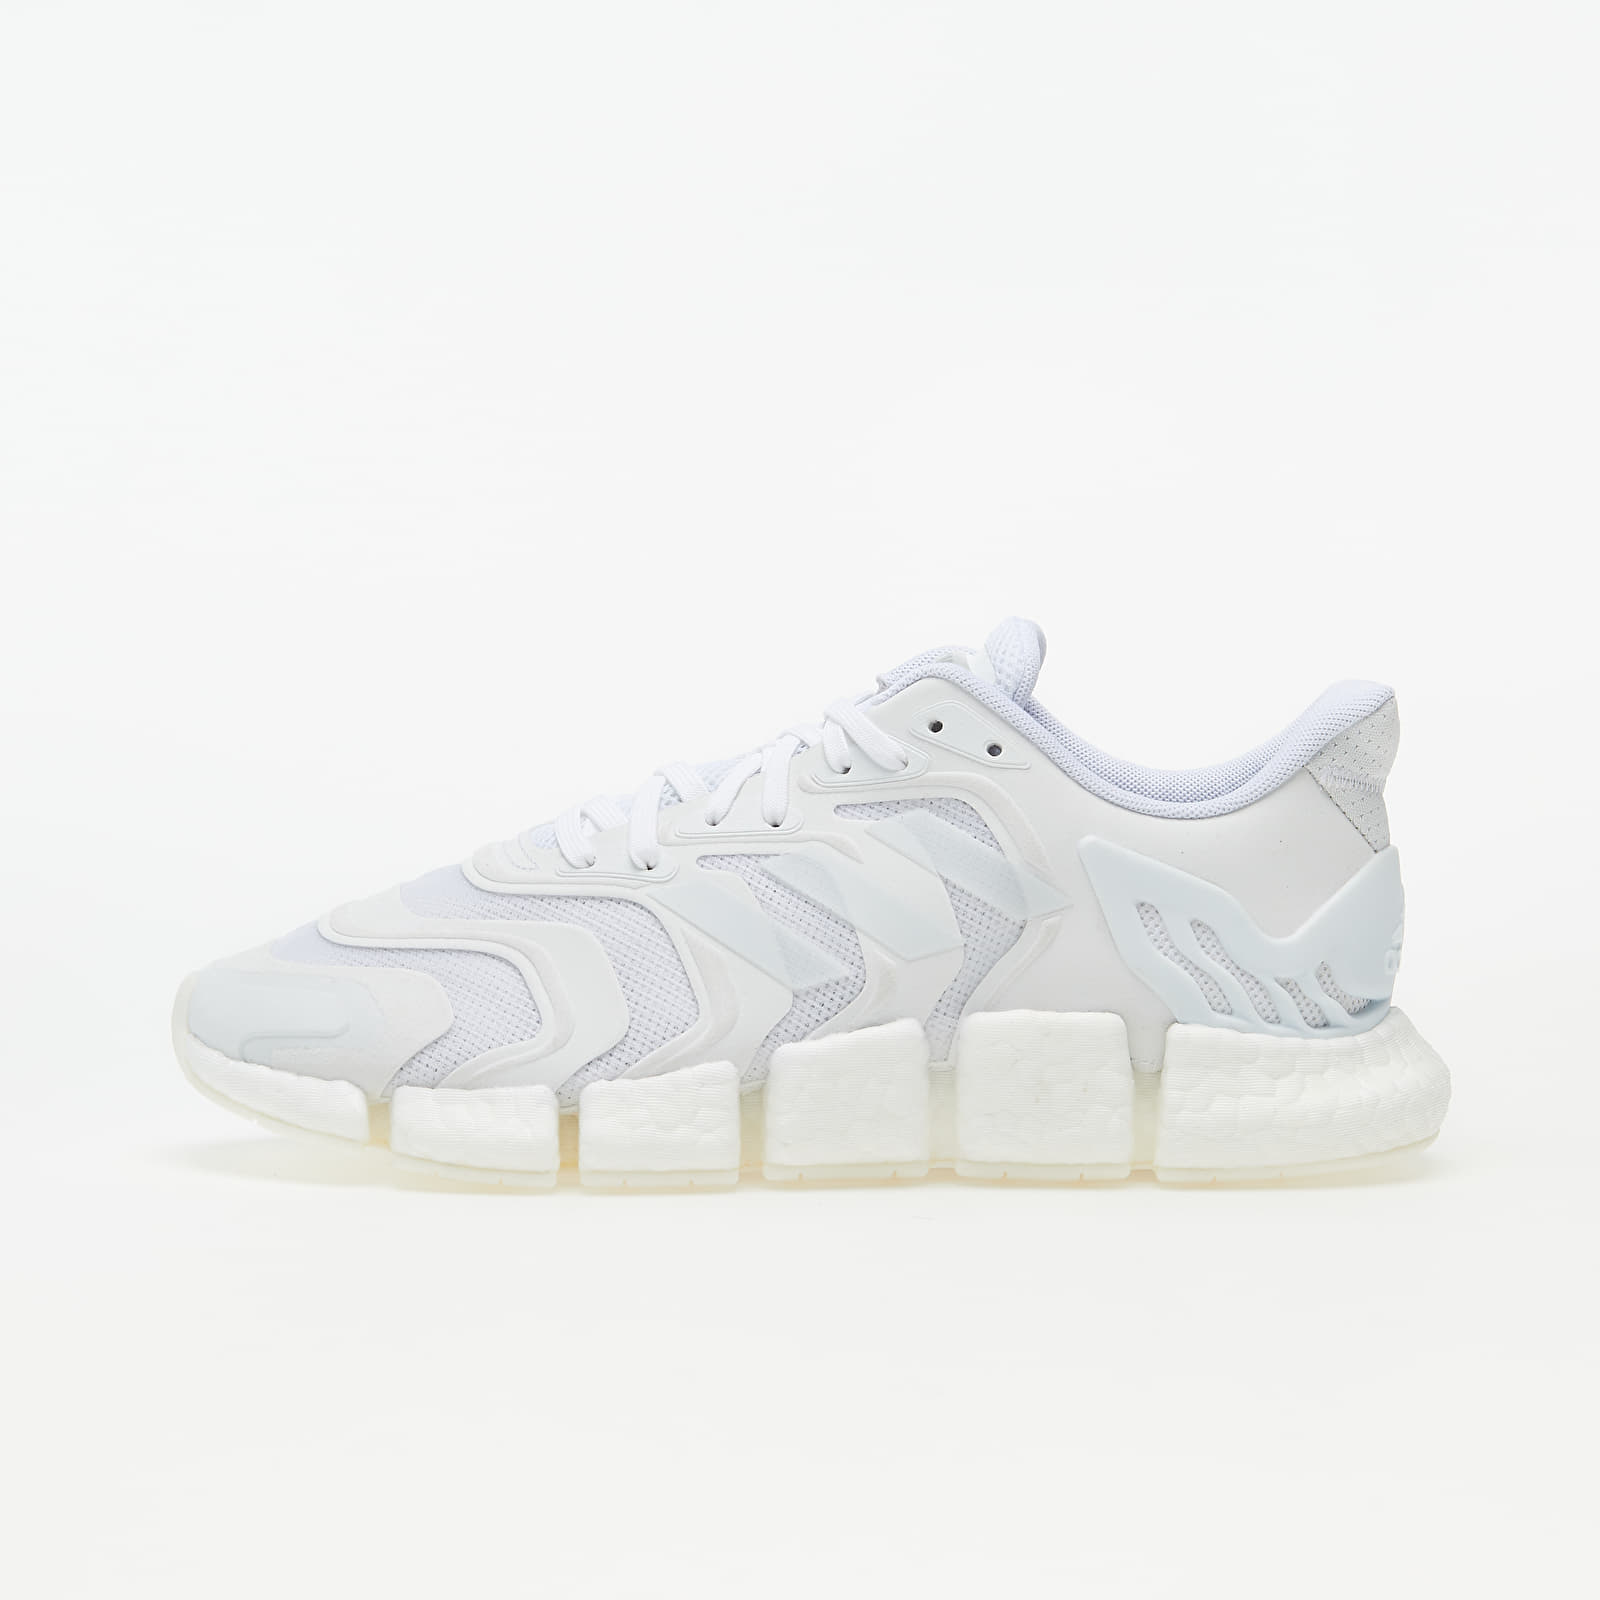 Pánské tenisky a boty adidas Climacool Vento Ftw White/ Ftw White/ Ftw White